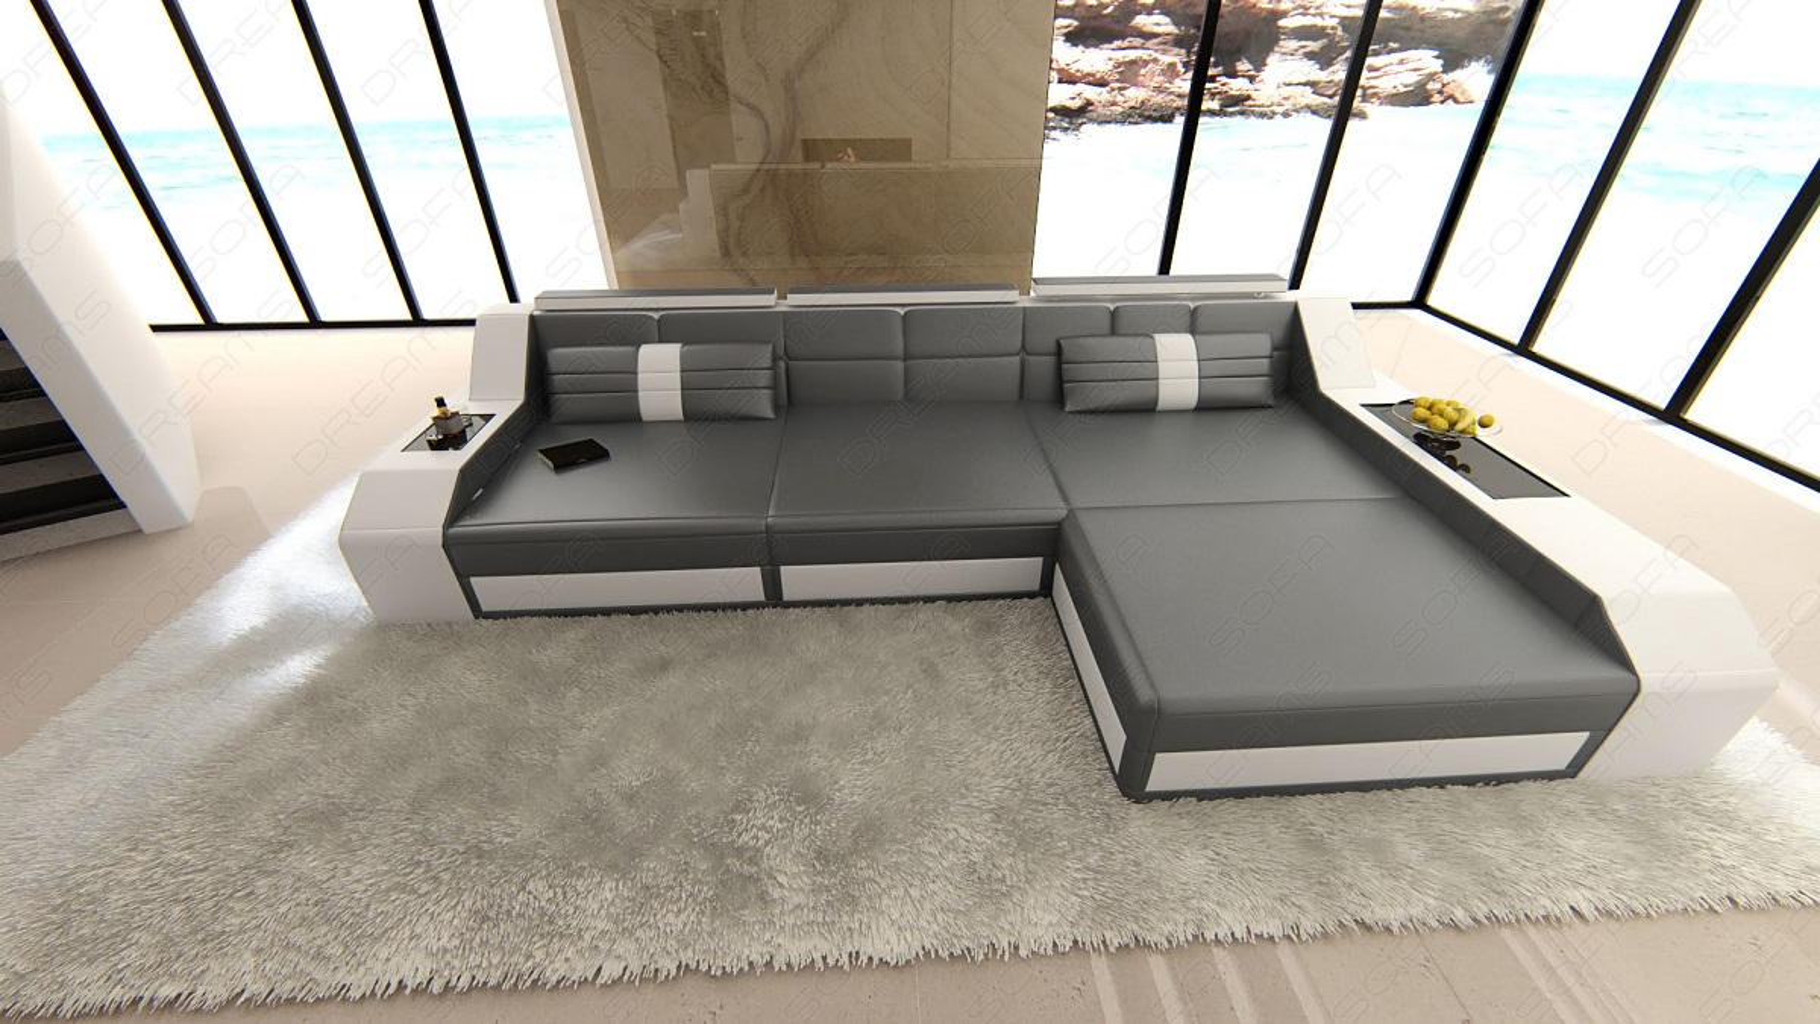 sofa grau pepe grau pepe chocolate with sofa grau best sofa grau loft grauessofa with sofa. Black Bedroom Furniture Sets. Home Design Ideas